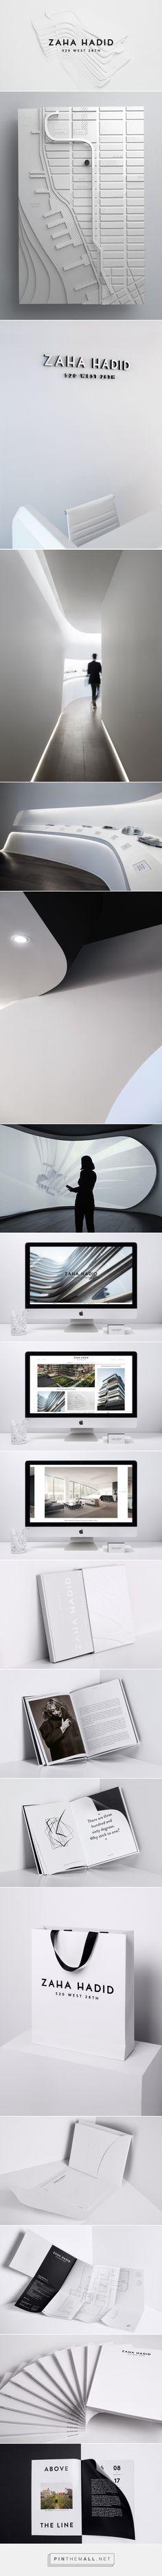 Mother Design — Zaha Hadid - created via https://pinthemall.net